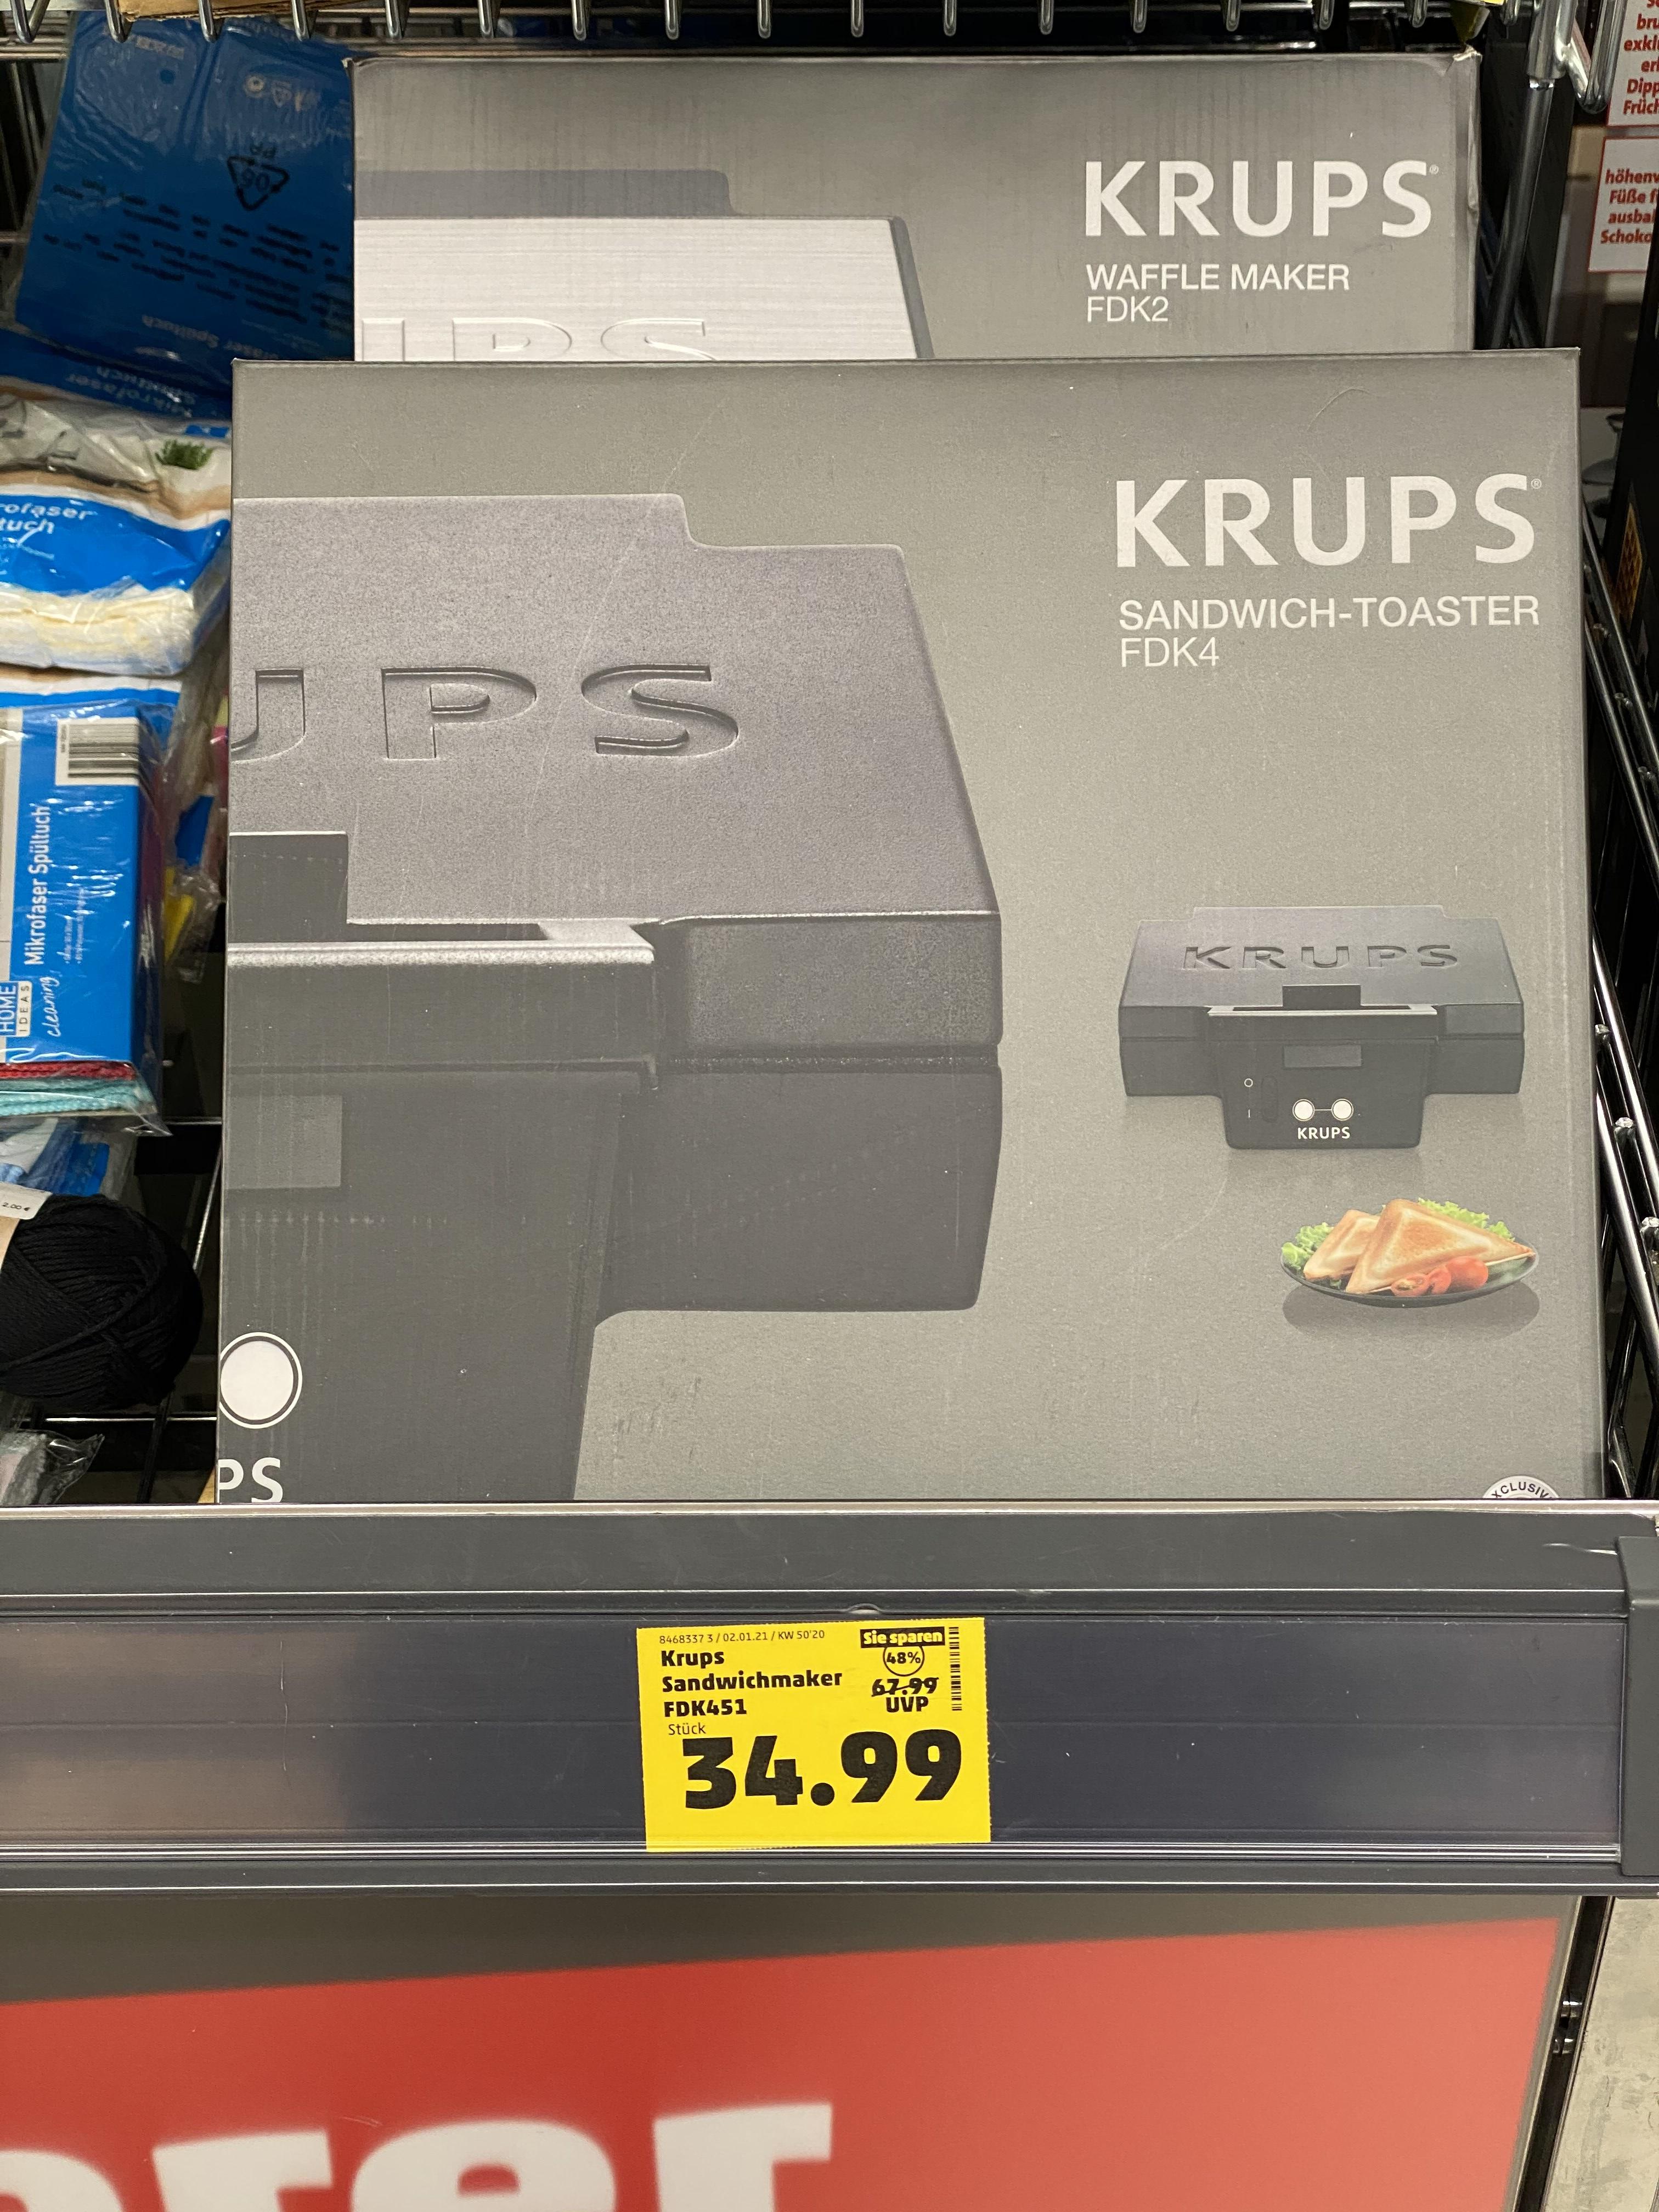 [Penny Offline] Minimalistischer Krups FDK451 Sandwich-Toaster/Maker 850W